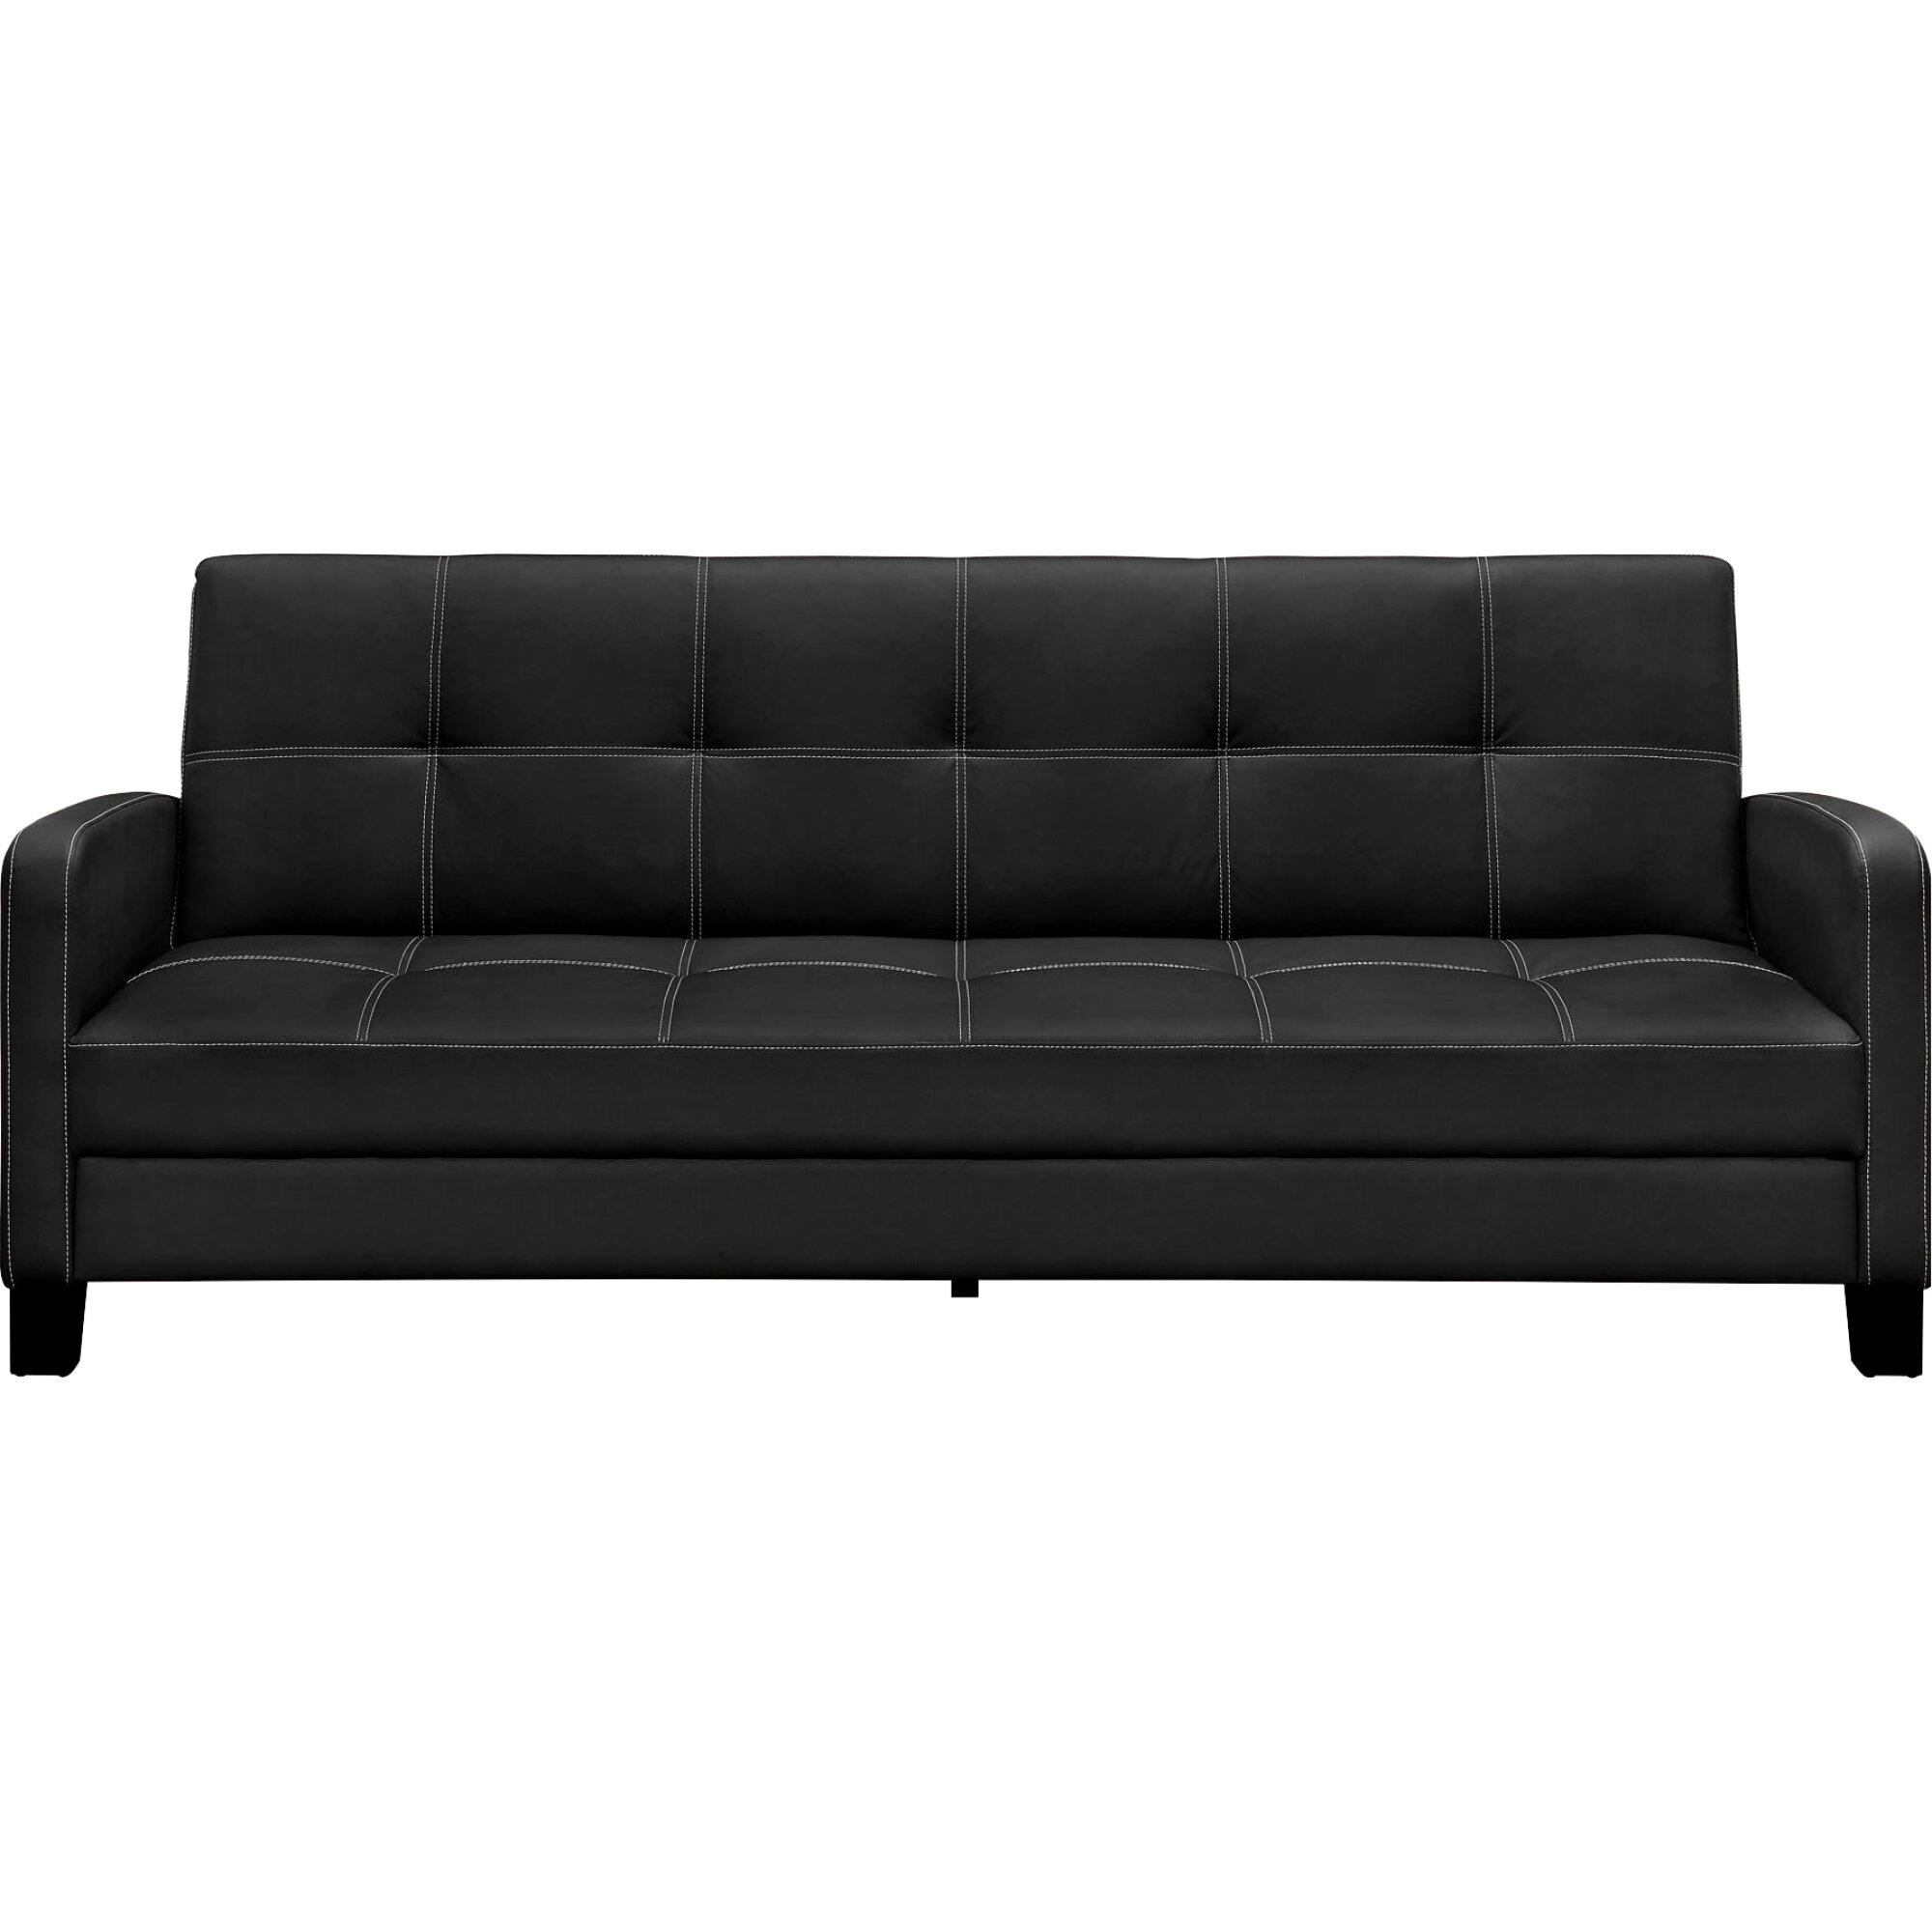 Dhp Delaney Sleeper Sofa Amp Reviews Wayfair Ca